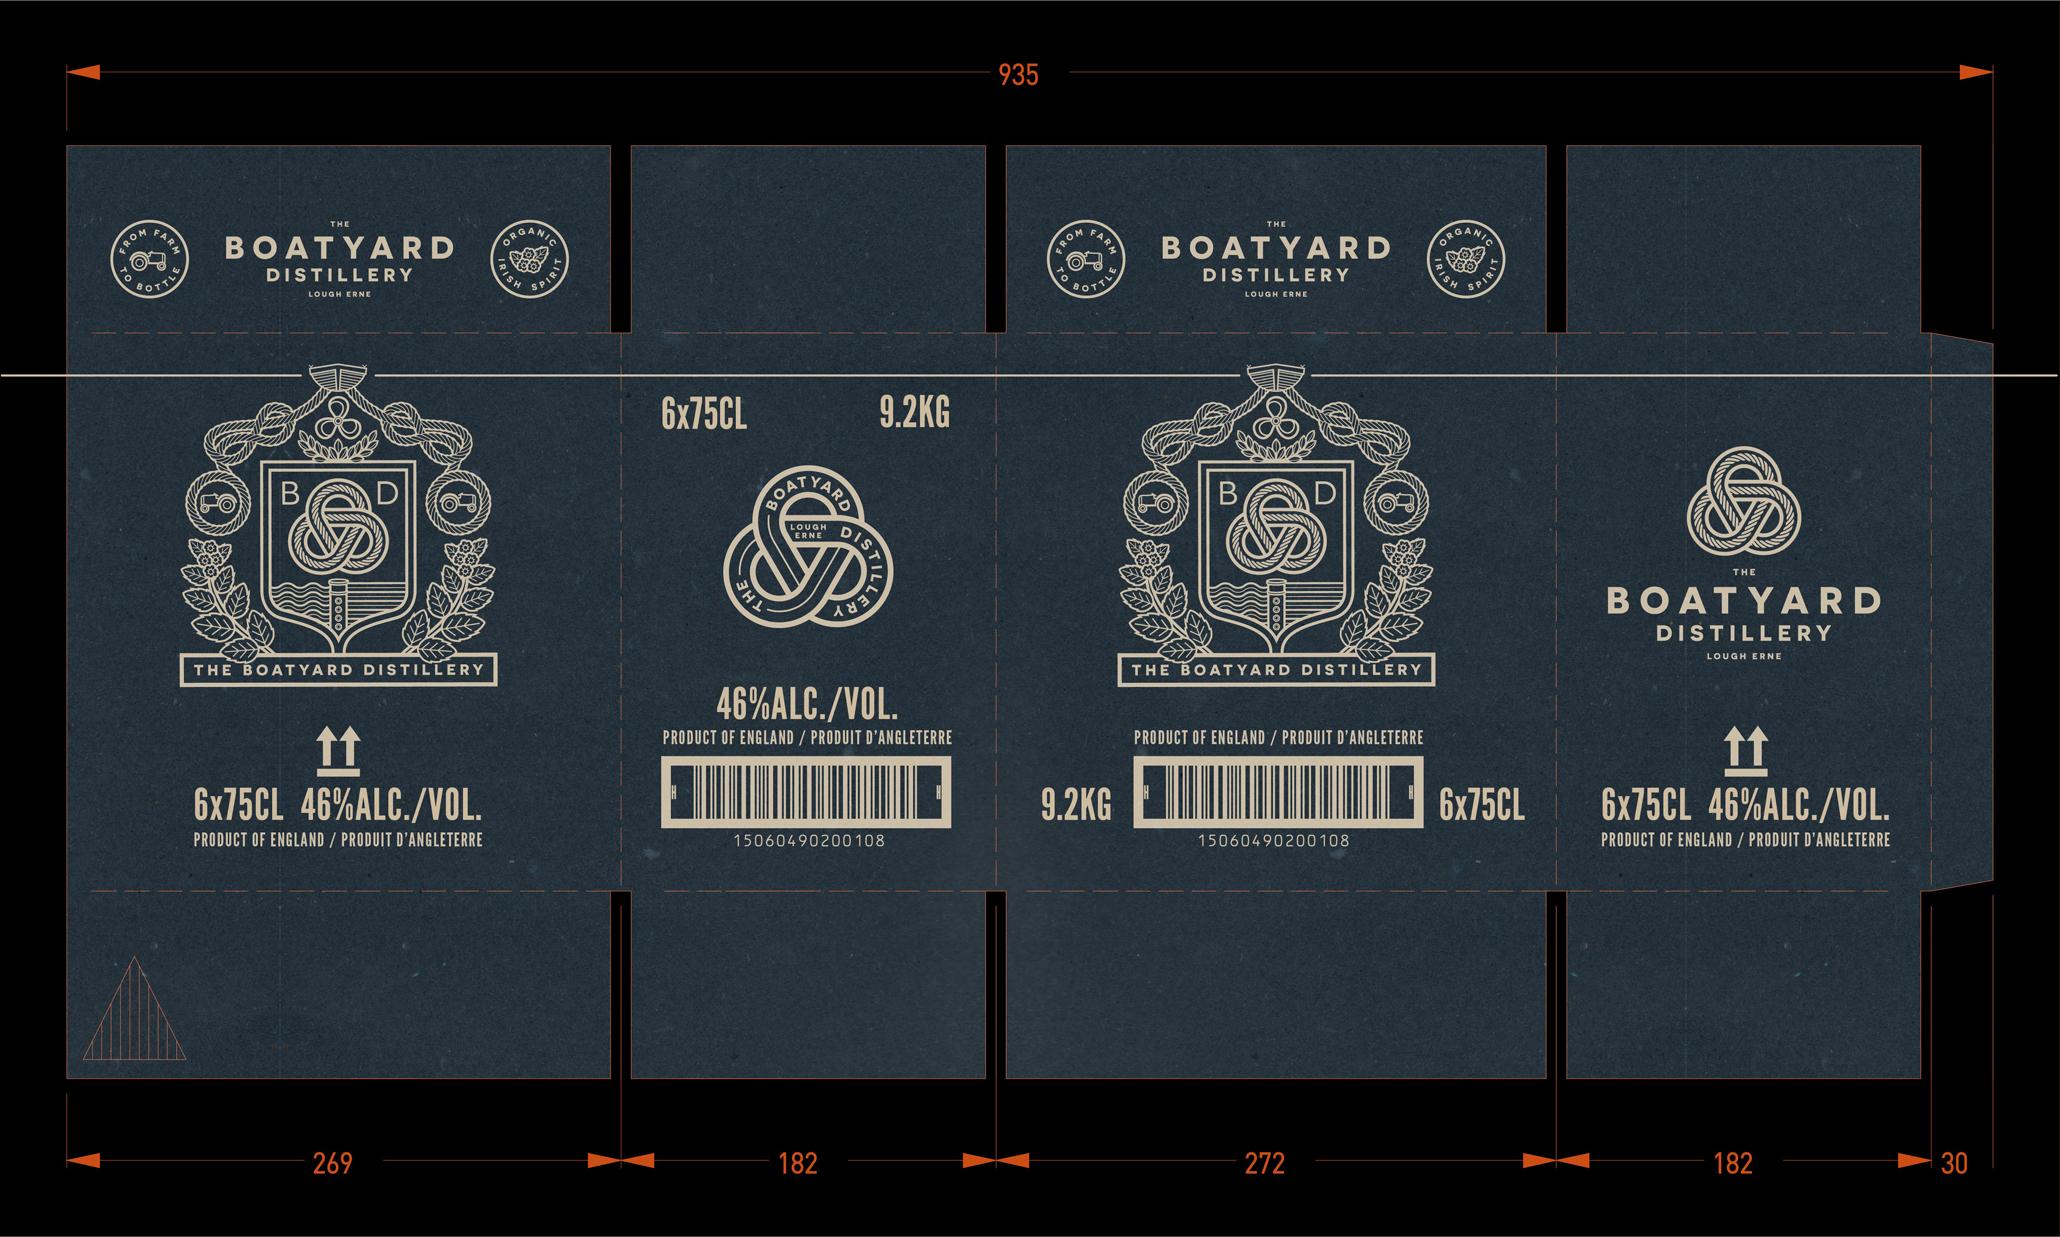 Boatyard-New-008.jpg